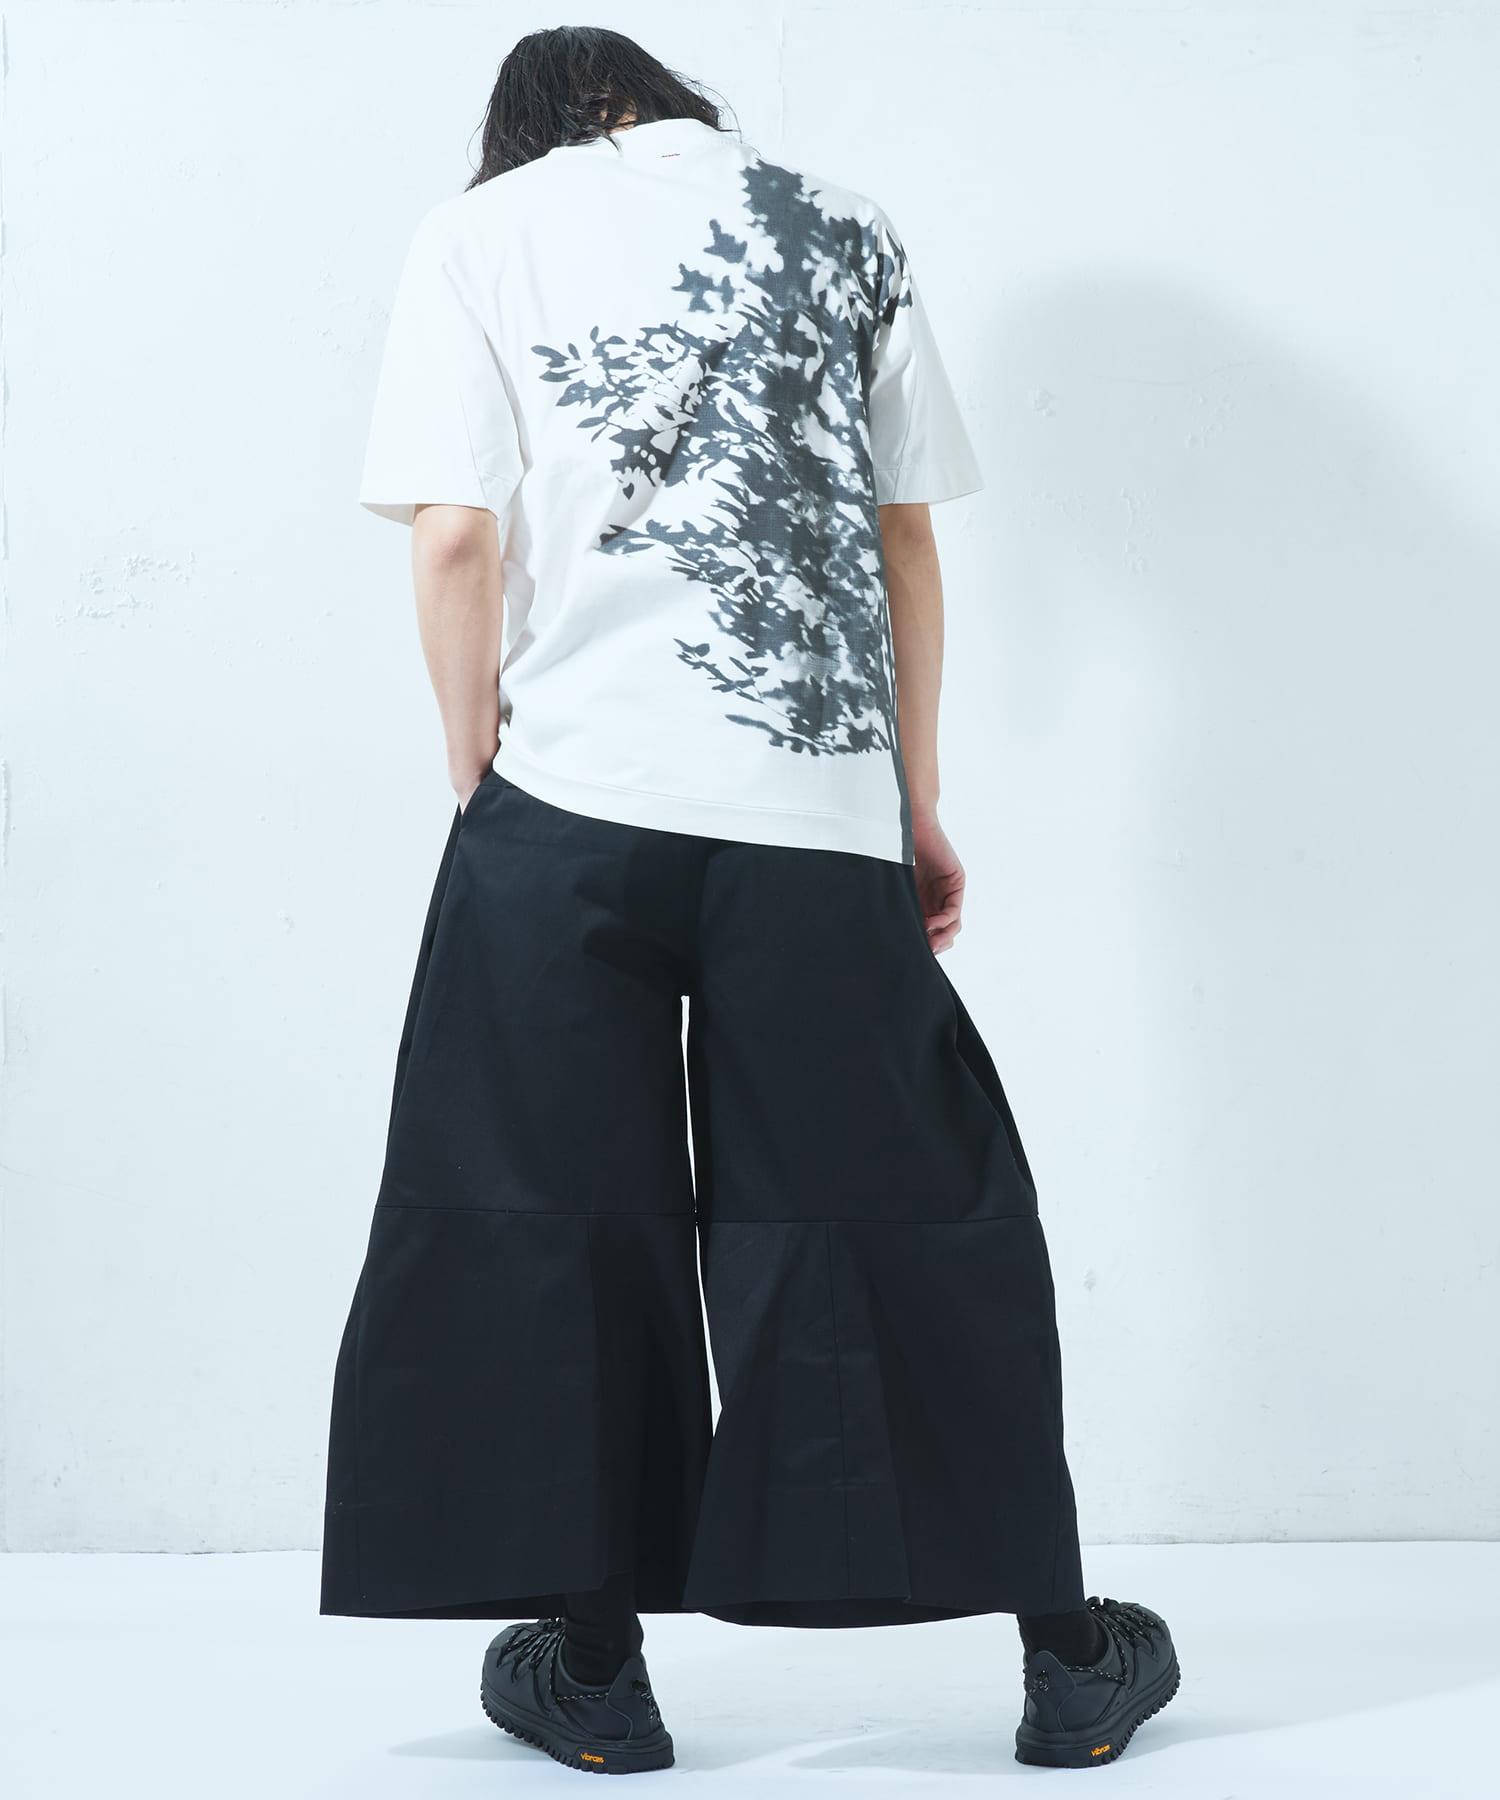 Lui's(ルイス) 【SHINYA KOZUKA/シンヤコヅカ】TREE(プリントTシャツ)